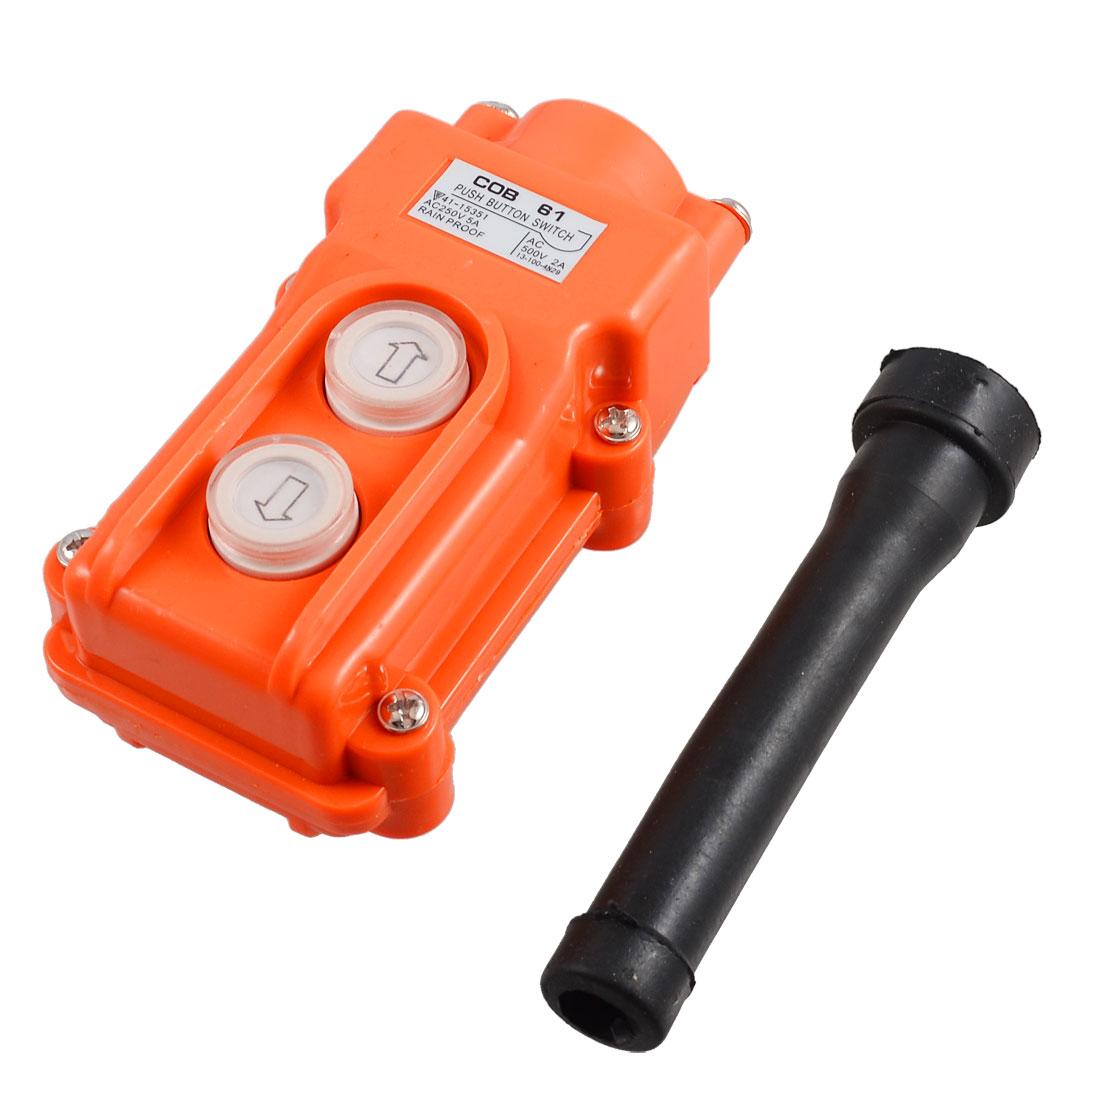 250V 5A 500V 2A 2 Ways Hoist Crane Push Button Switch Orange